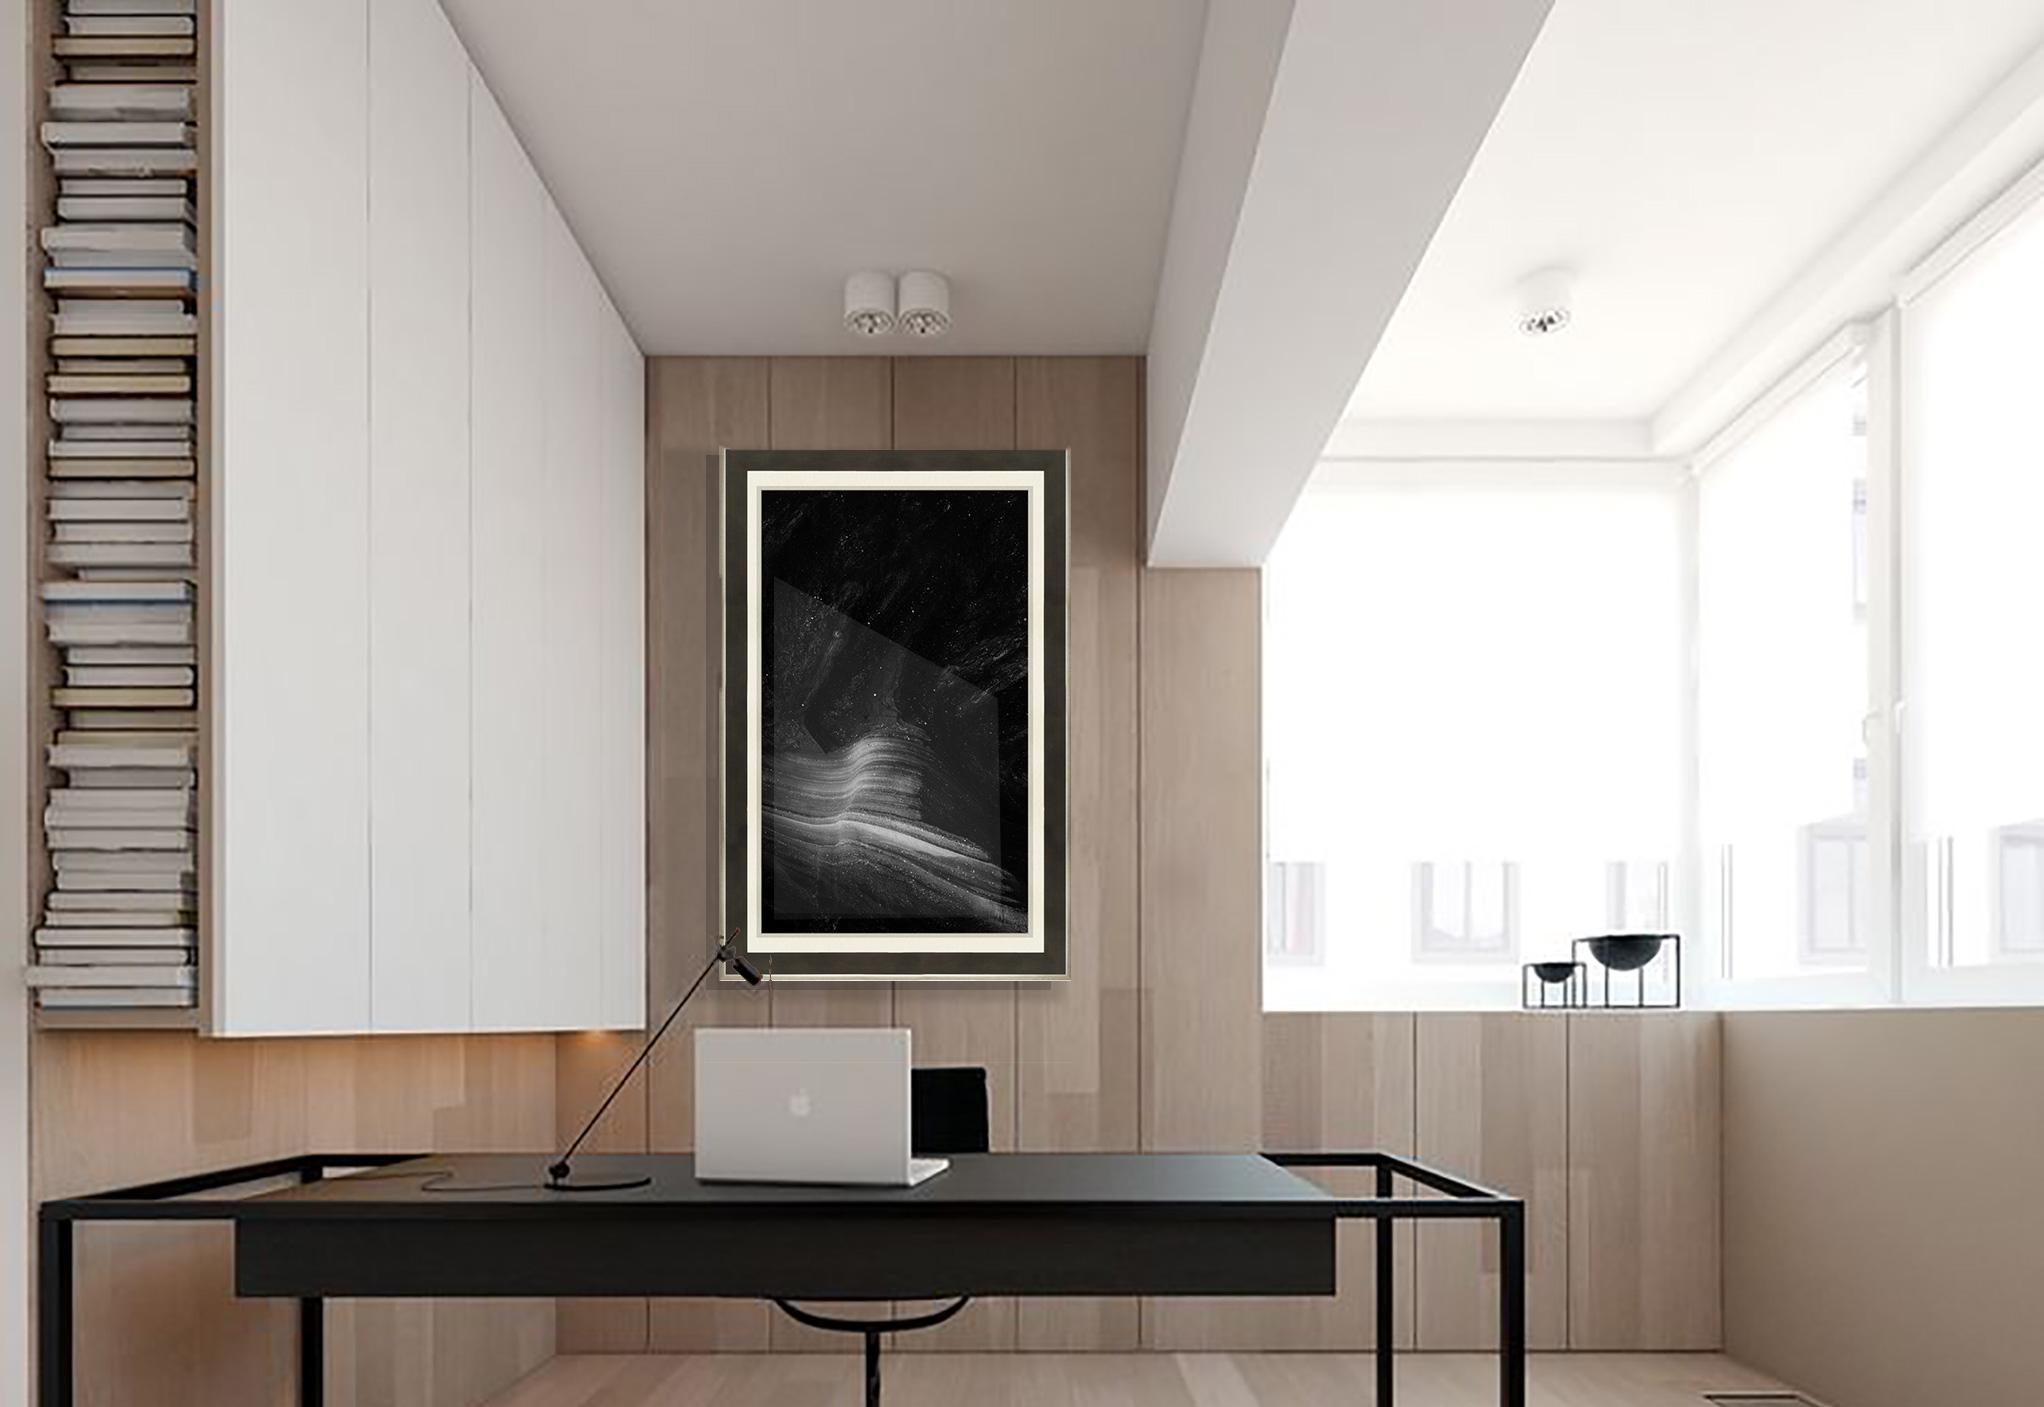 Darkness-in-home-I.jpg